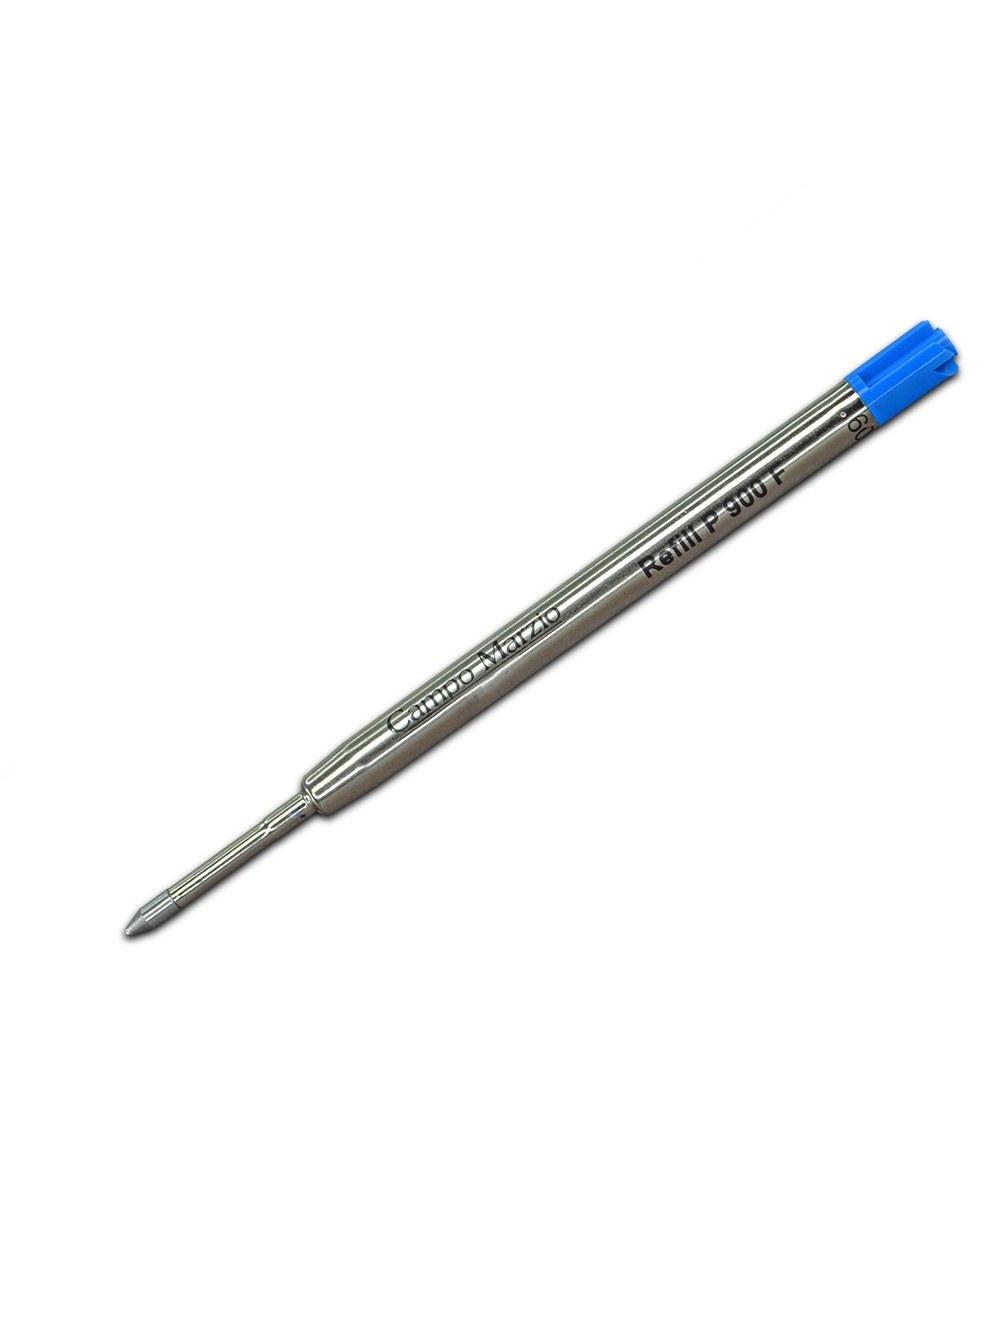 Refill Standard a Sfera 1.2 mm - Blu Oceano